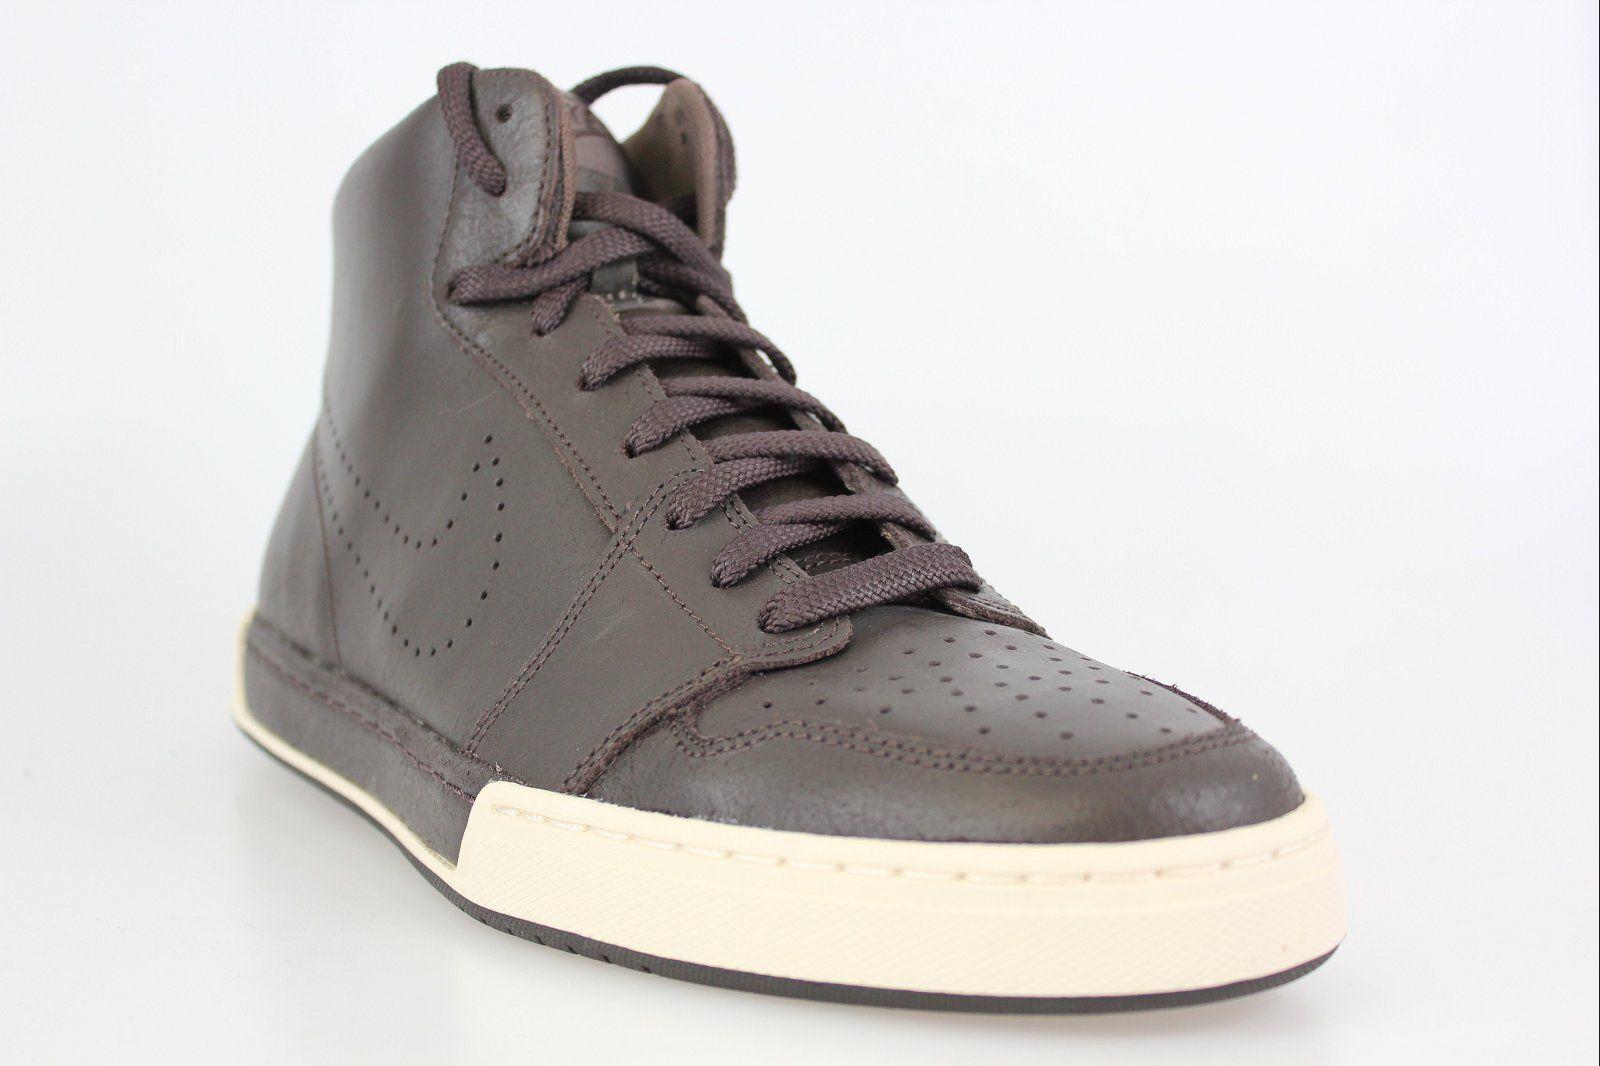 Nike Air Royal Mid Leather High Hi Neu Boot Mandara Leather Mid Karst Manoa Gr 8eec6f